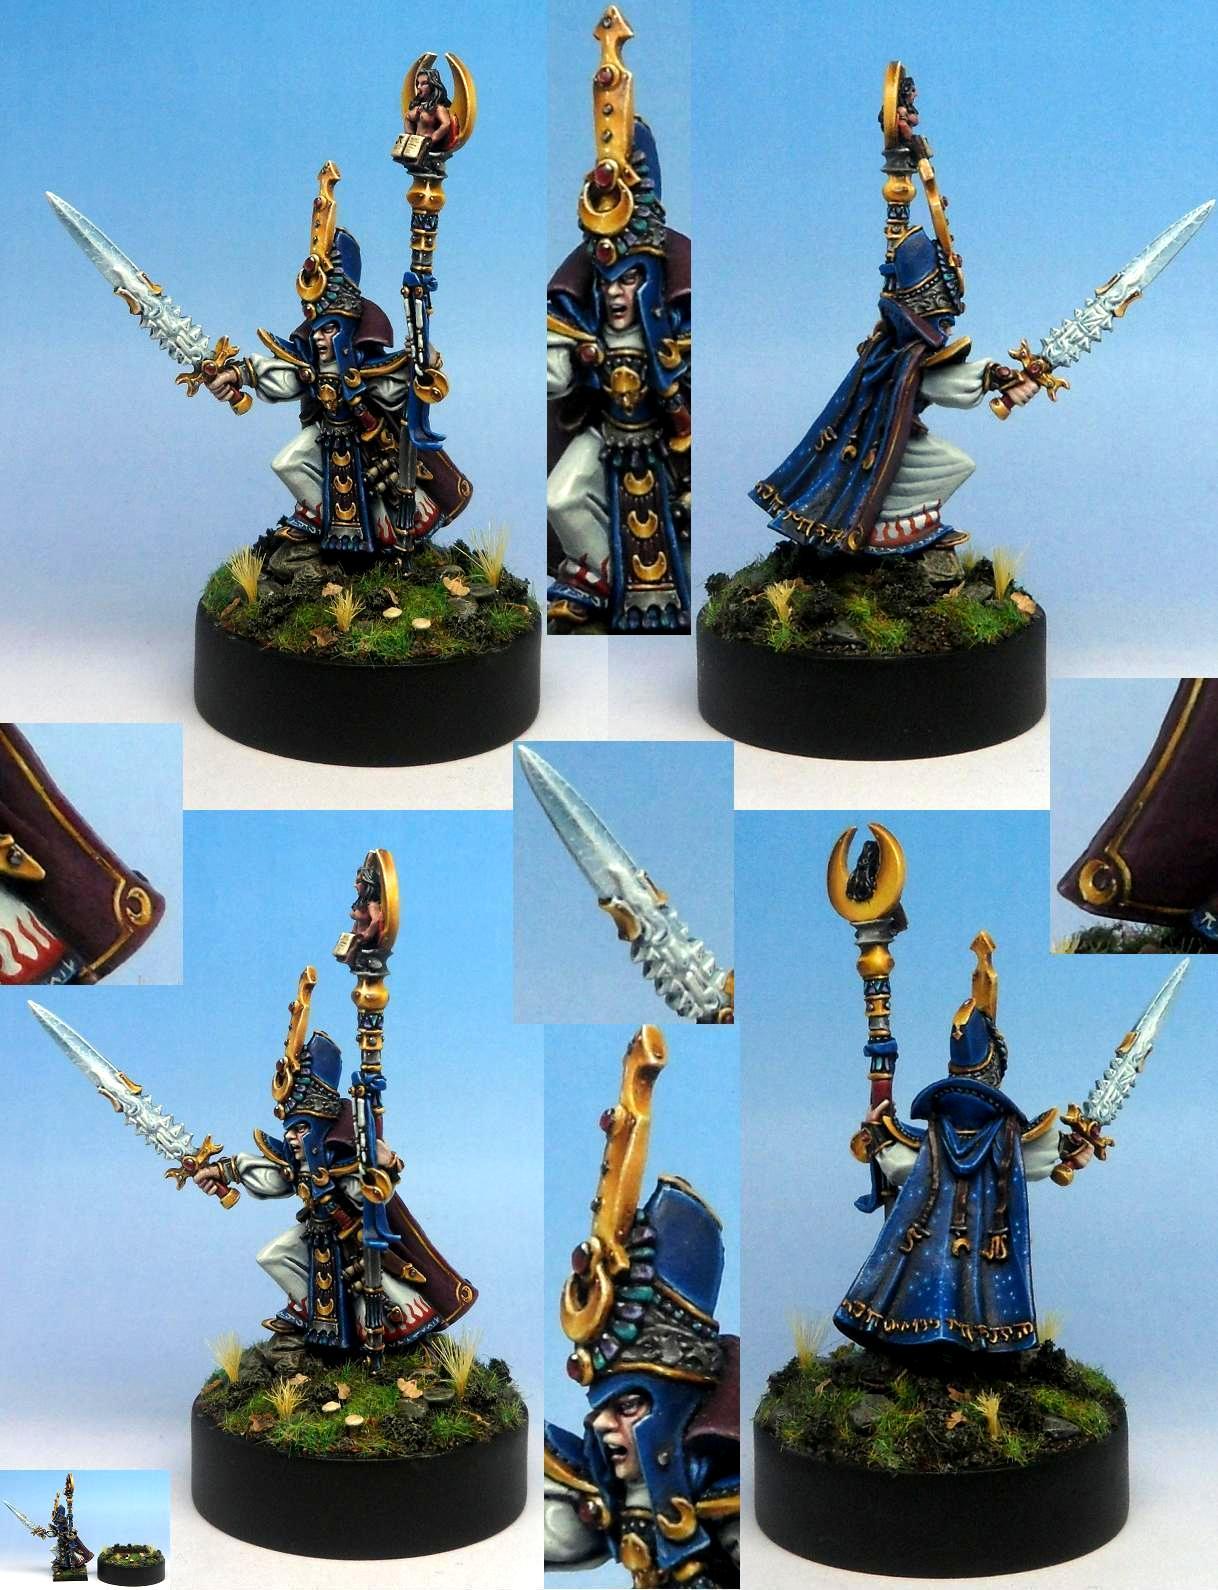 High Elves, Non-Metallic Metal, Warhammer Fantasy